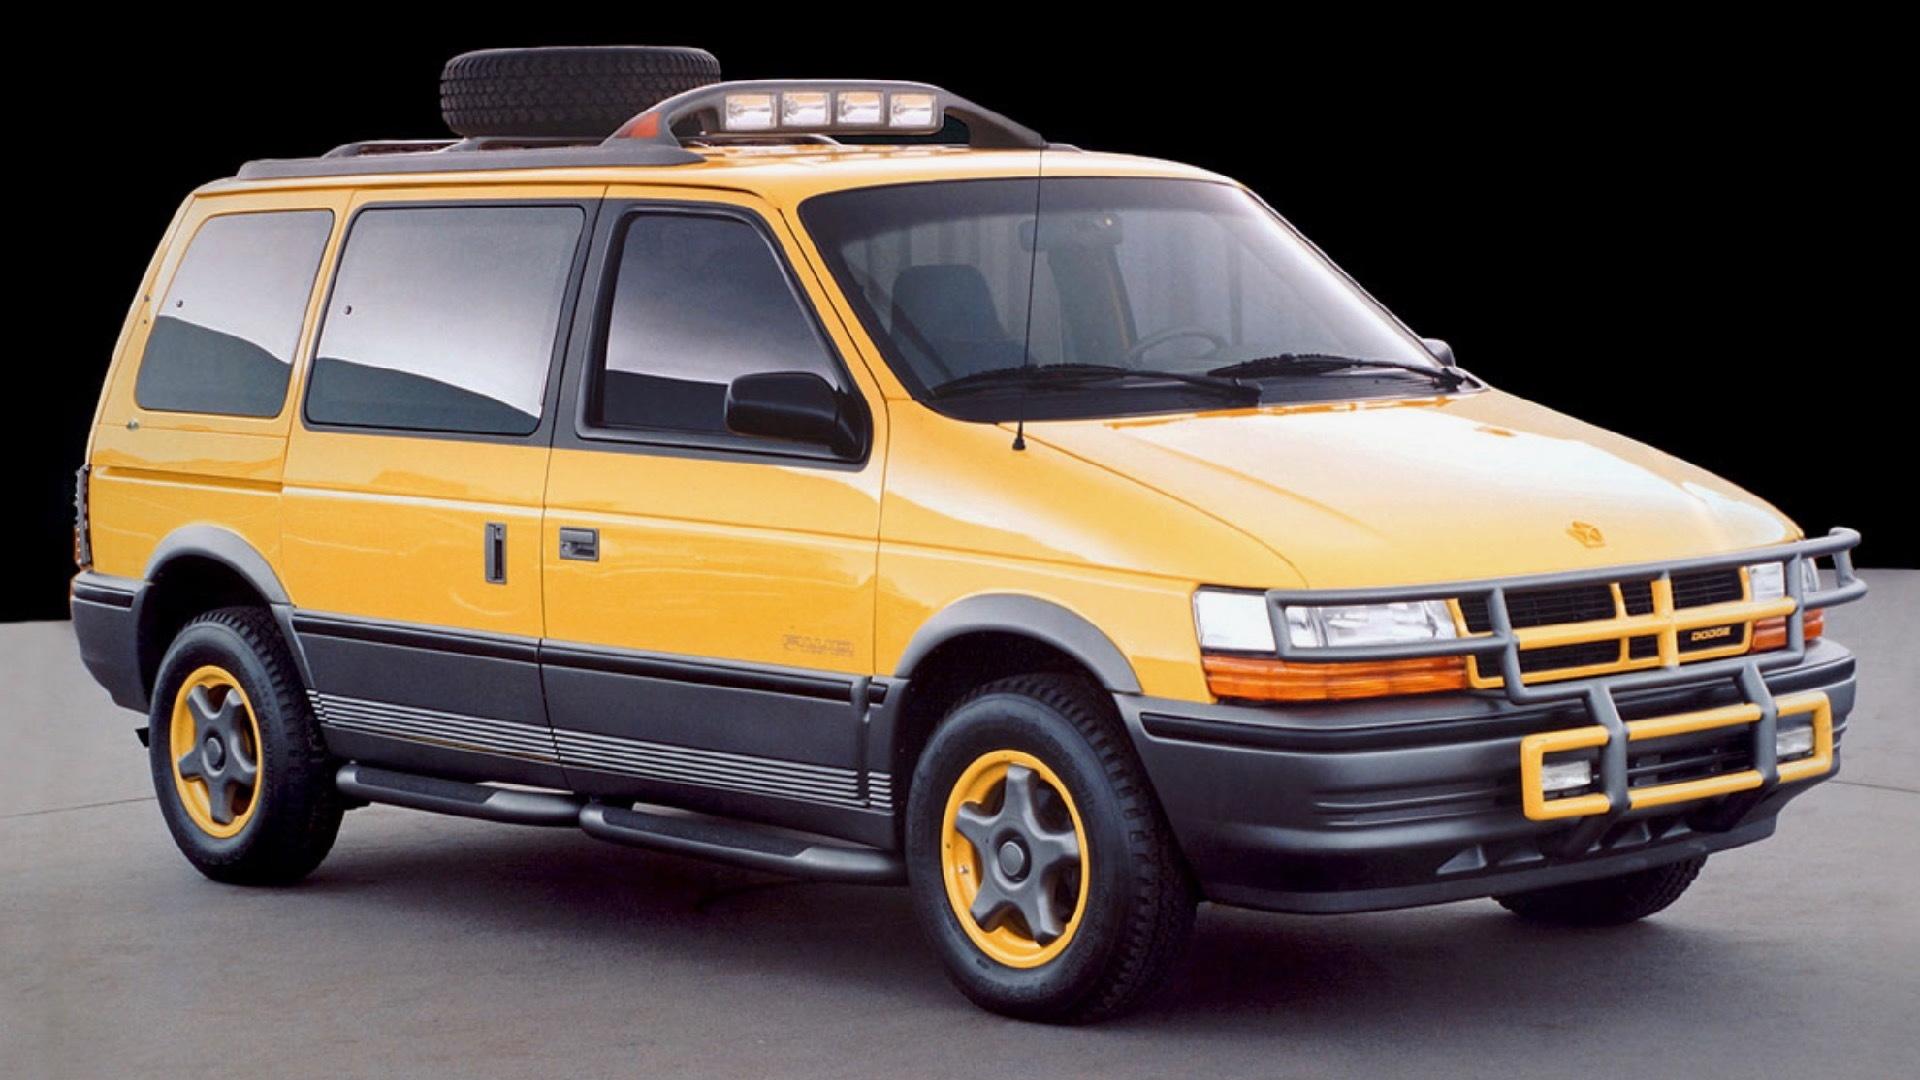 Dodge Caravan off-road concept (via Michael Santoro)